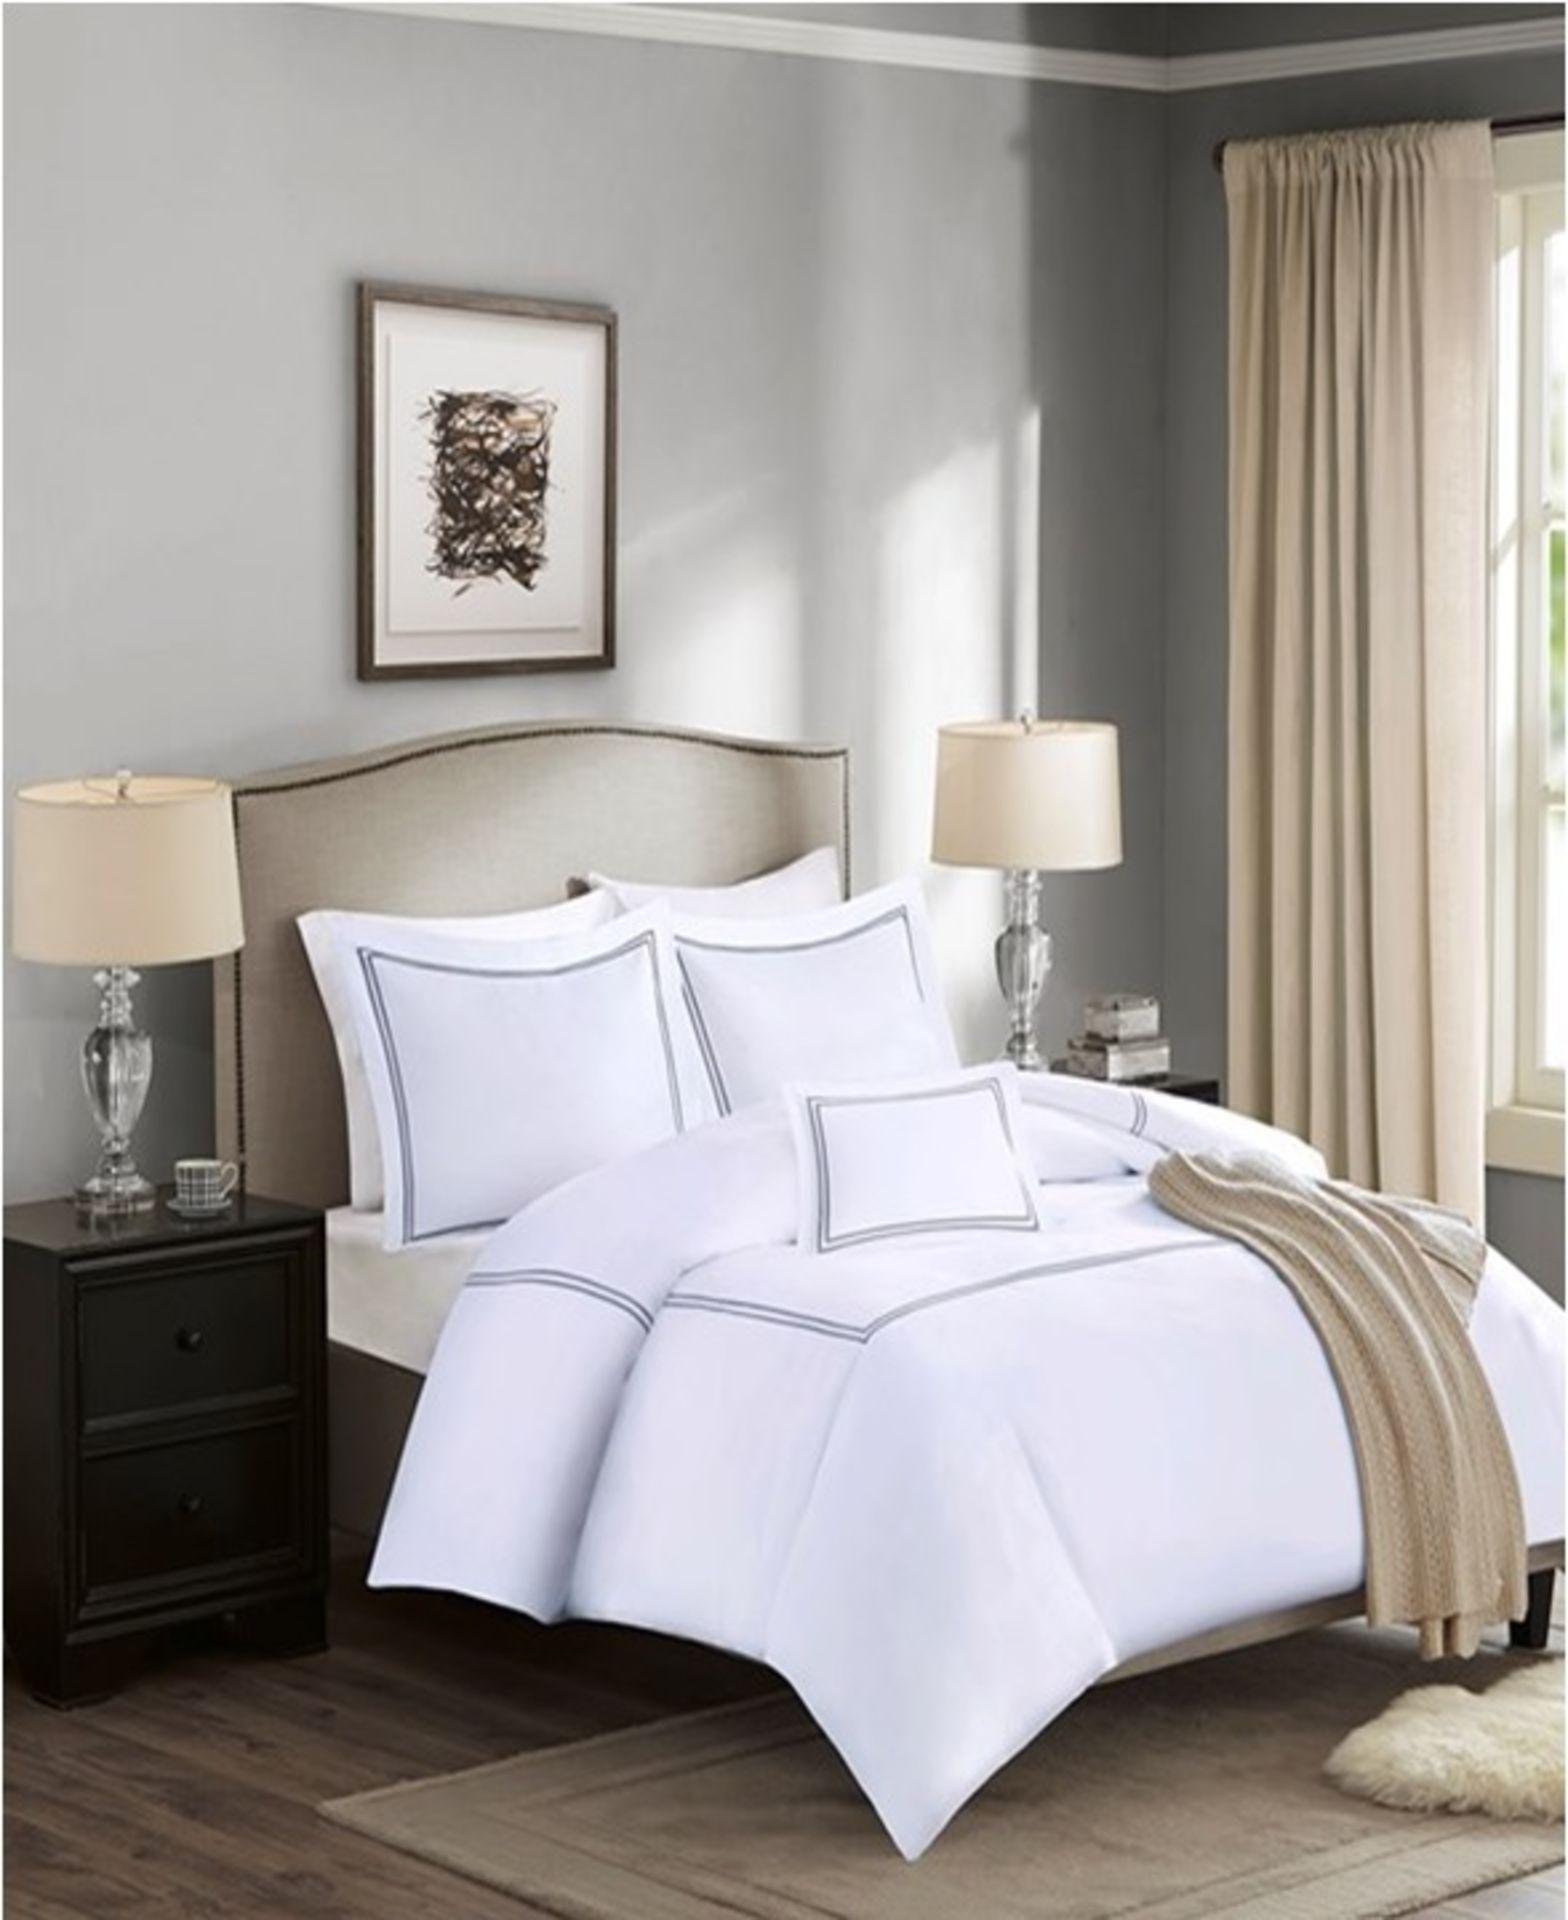 Lot 153 - 1 x Madison Park Luxury Collection Double Duvet Set White - Product Code MP12-0198UK (Brand New -